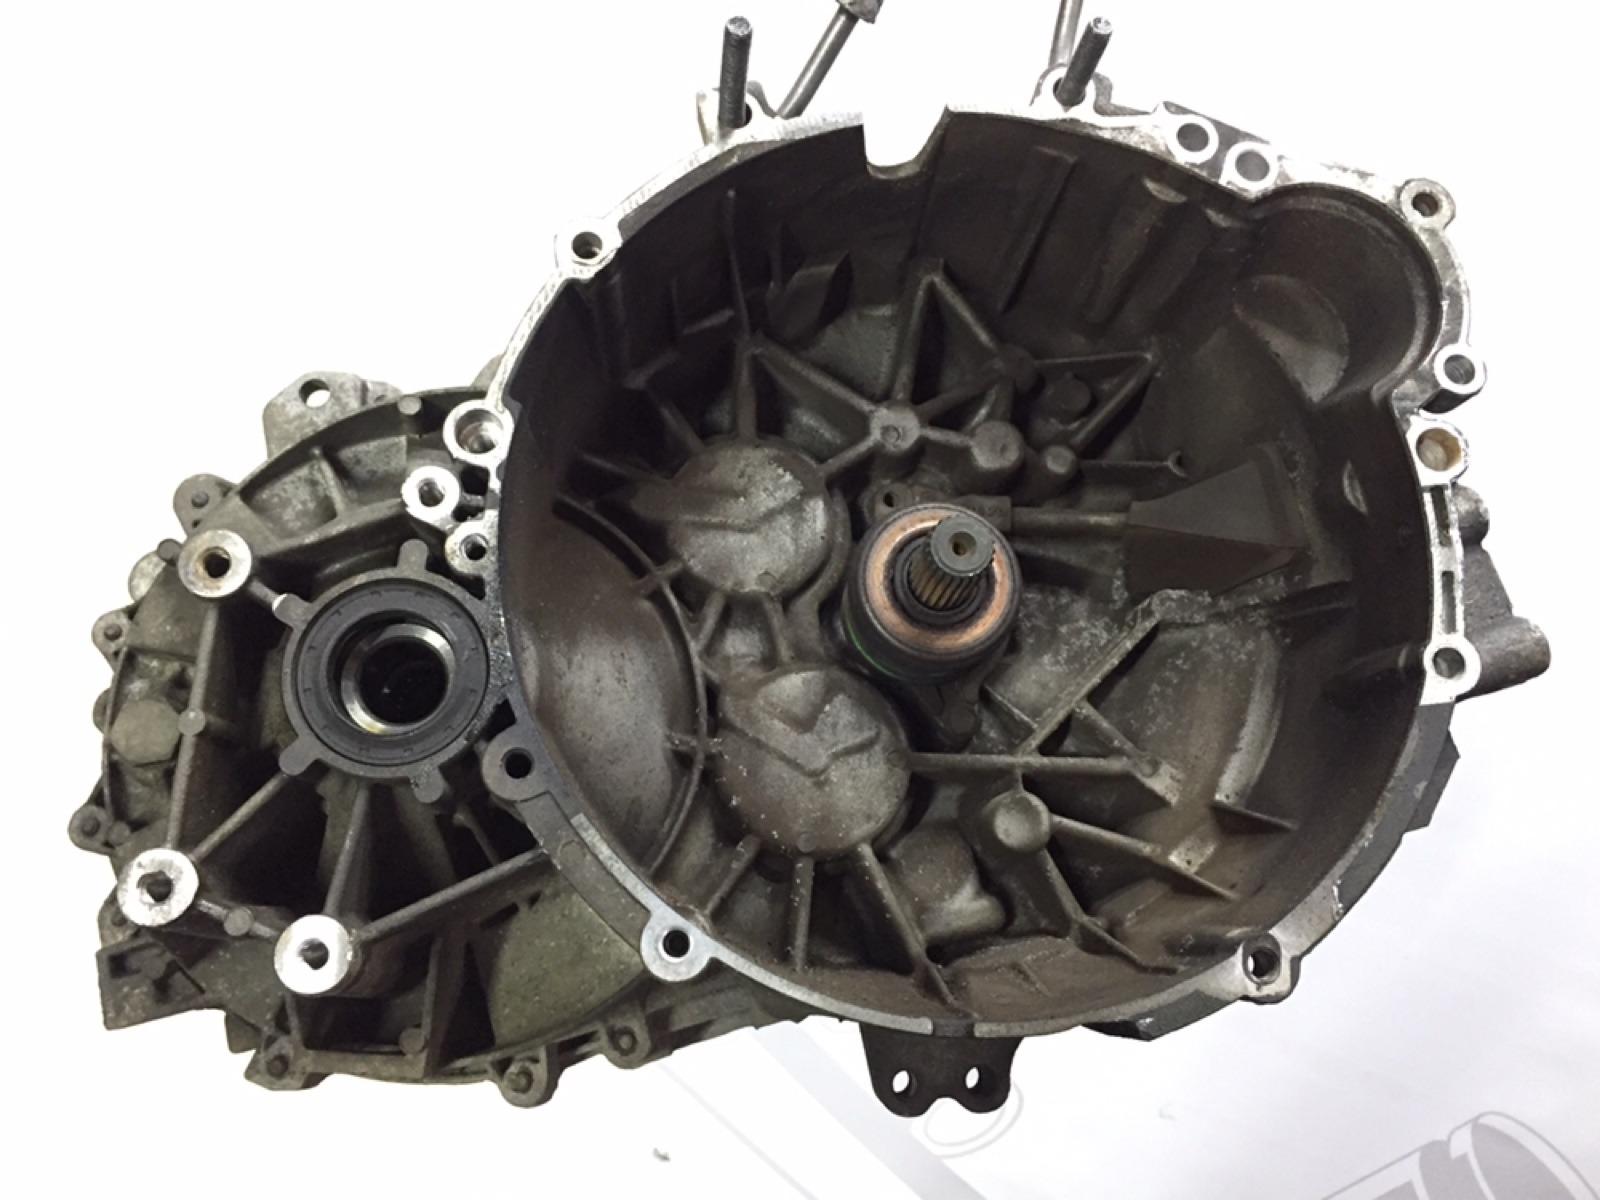 Кпп механическая (мкпп) Volvo V40 1.8 I 2004 (б/у)